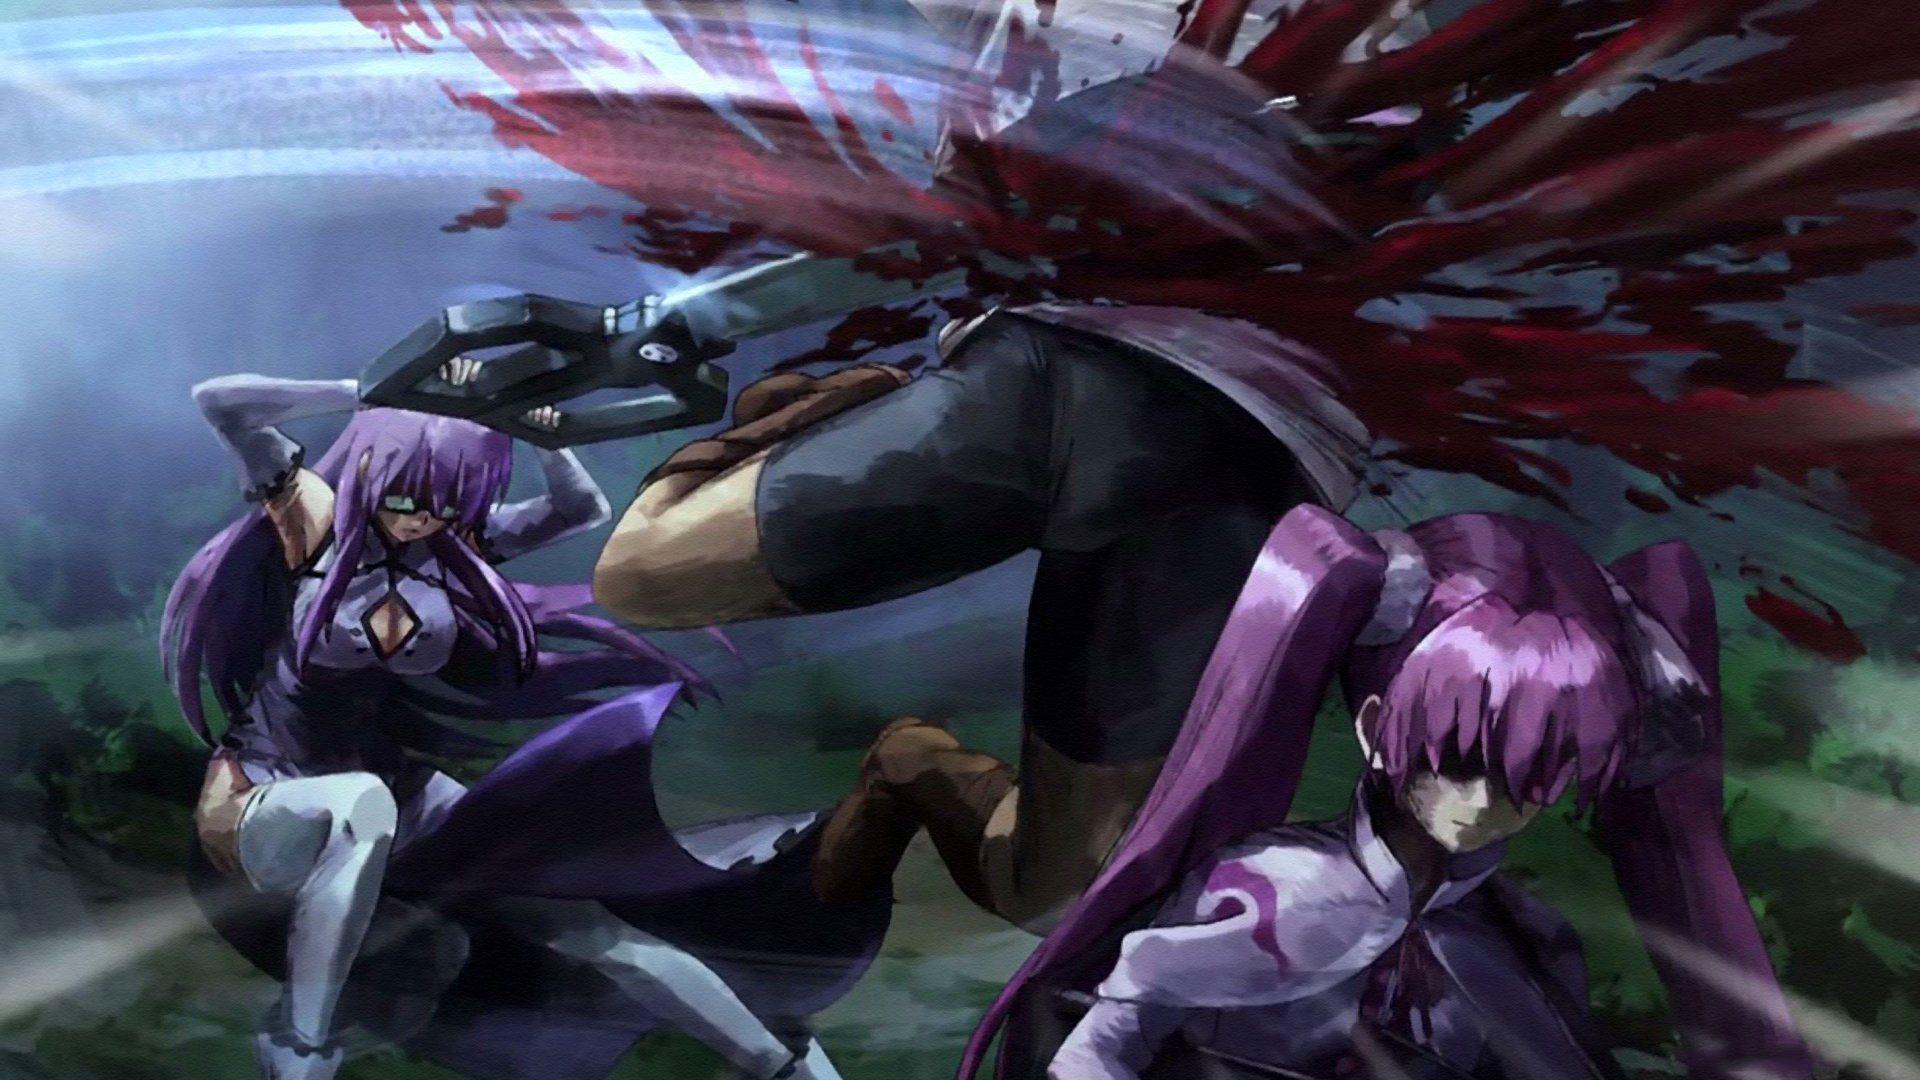 Mine Sheele Akame Ga Kill Animasi